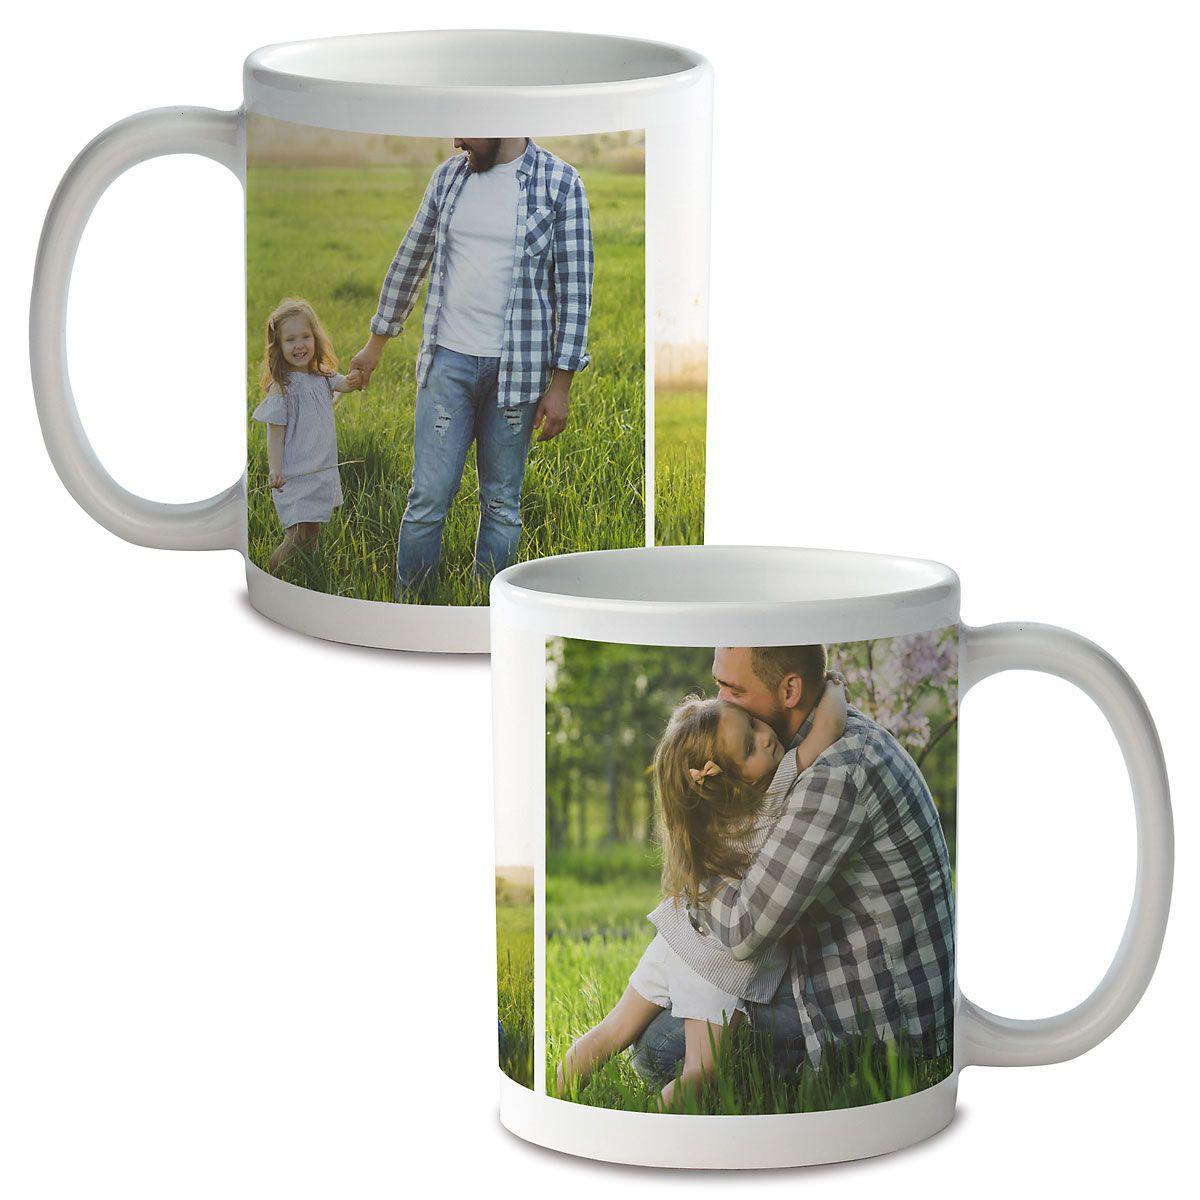 Collage 3 Ceramic Photo Mug